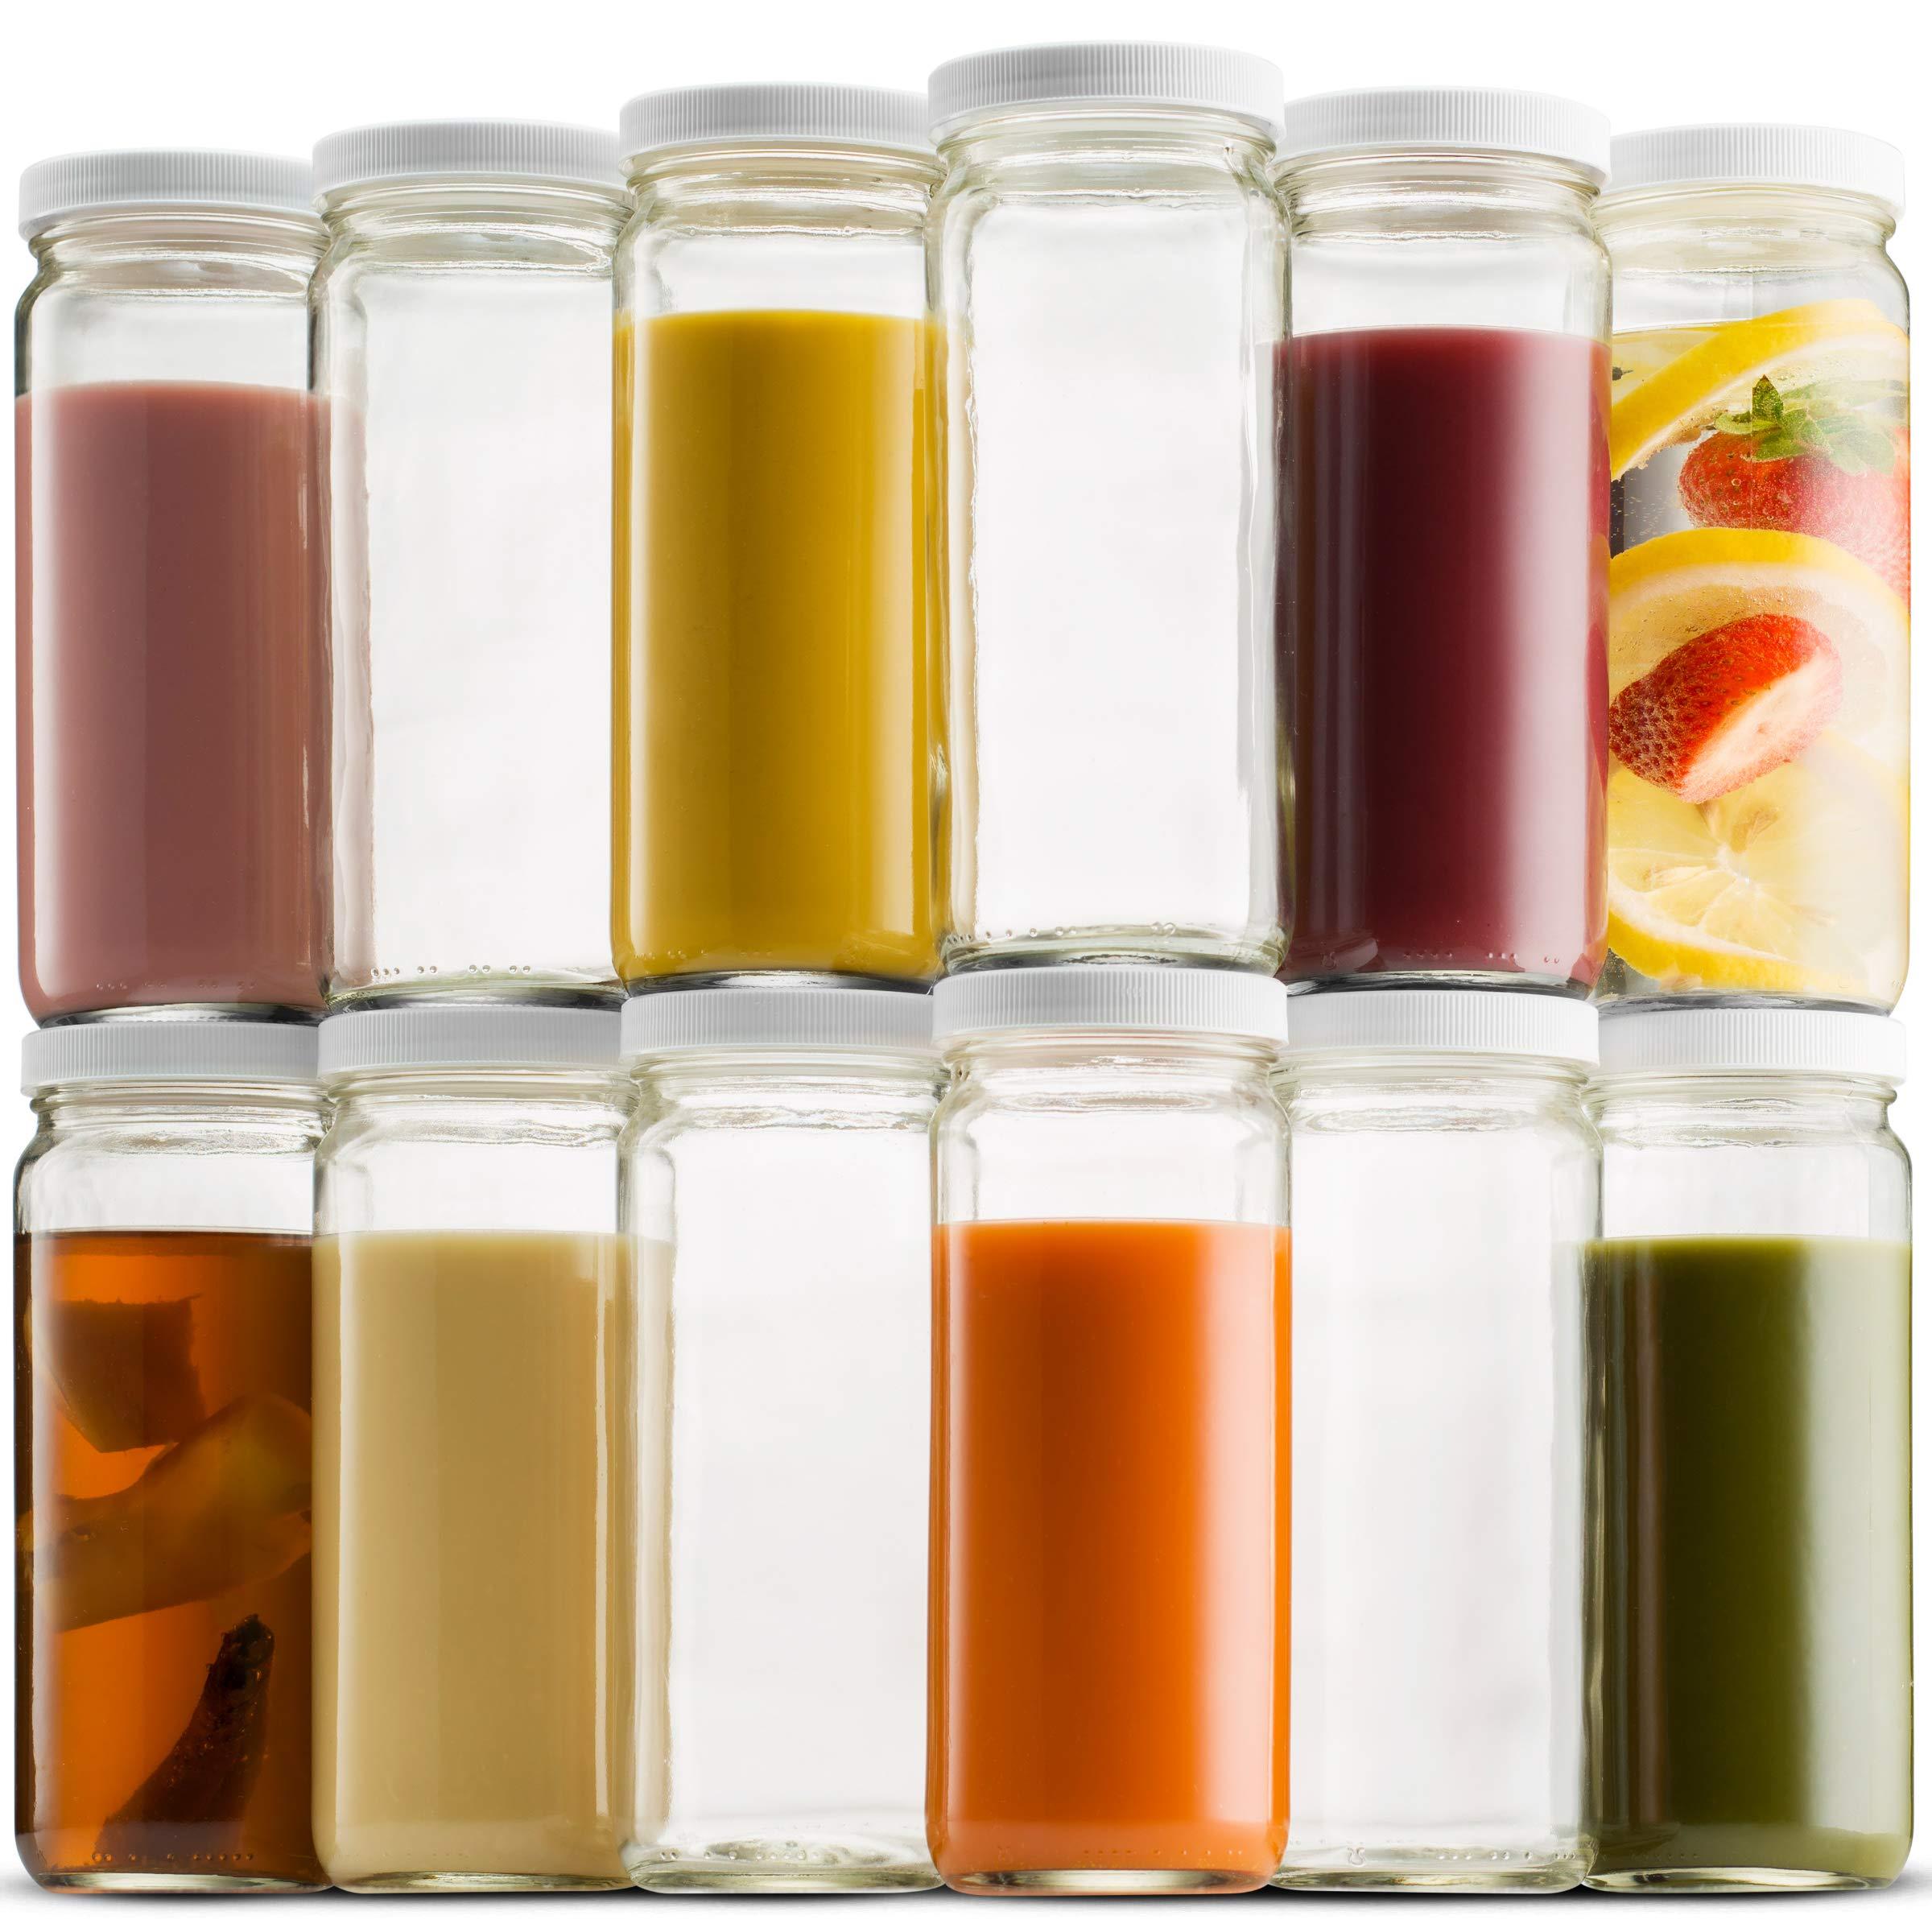 Travel Glass Drinking Bottle Mason Jar 16 Ounce [12-Pack] BPA-Free Plastic Airtight Lids, Reusable Glass Water Bottle for Juicing, Smoothies, Kombucha, Tea, Milk Bottles, Homemade Beverages Bottle, by Paksh Novelty